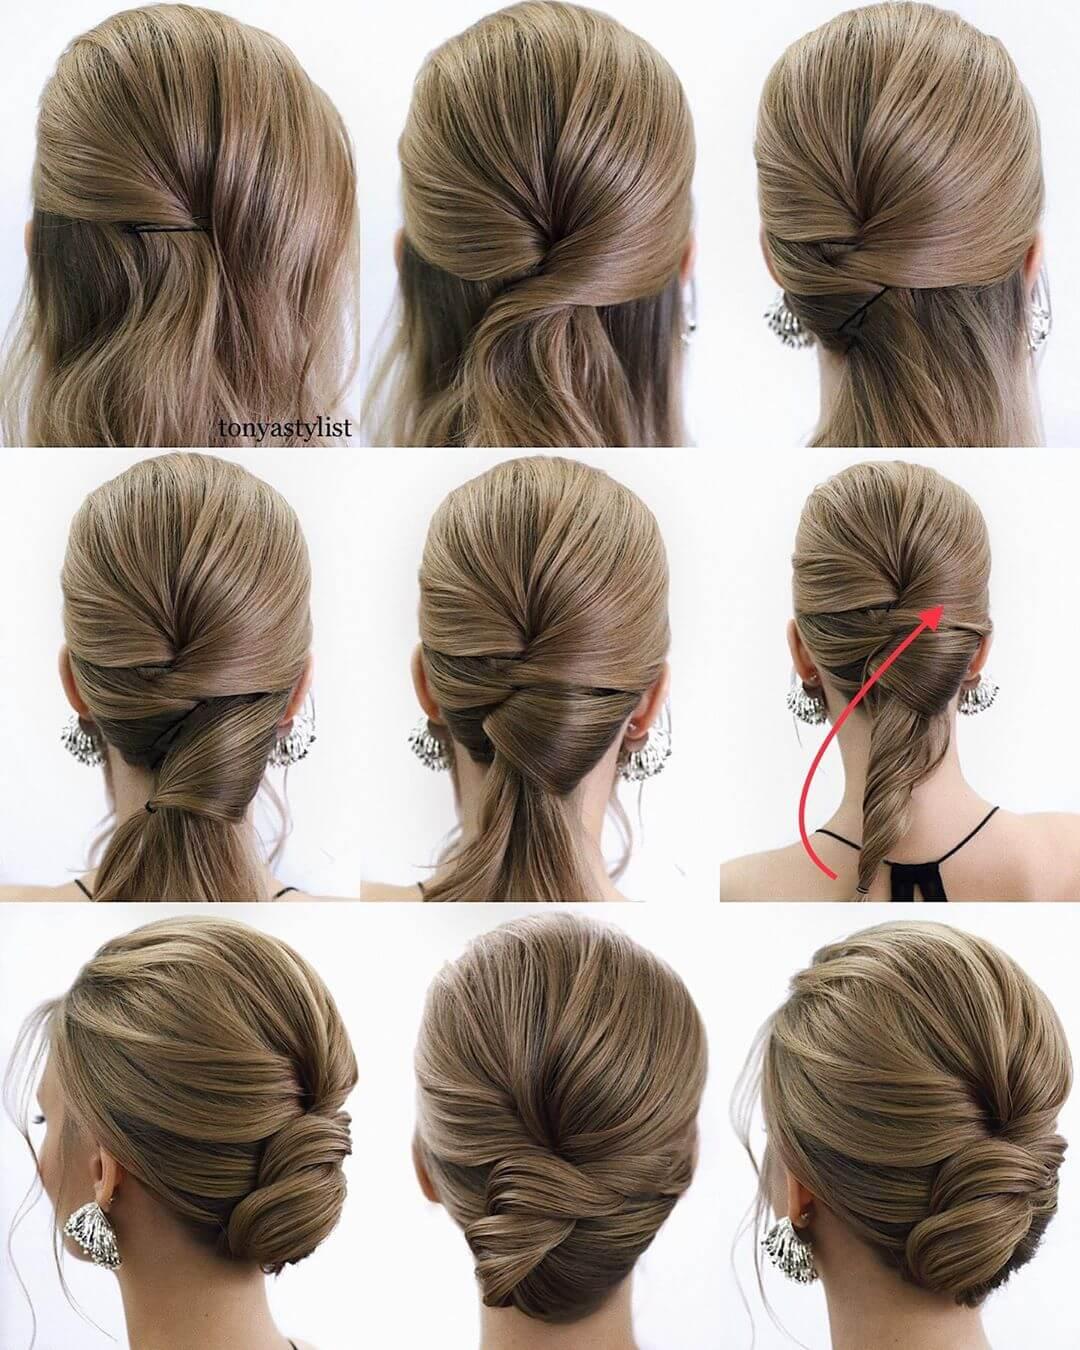 Step by Step Twist in lower bun Hairstyles for Long, Medium, Short Hair